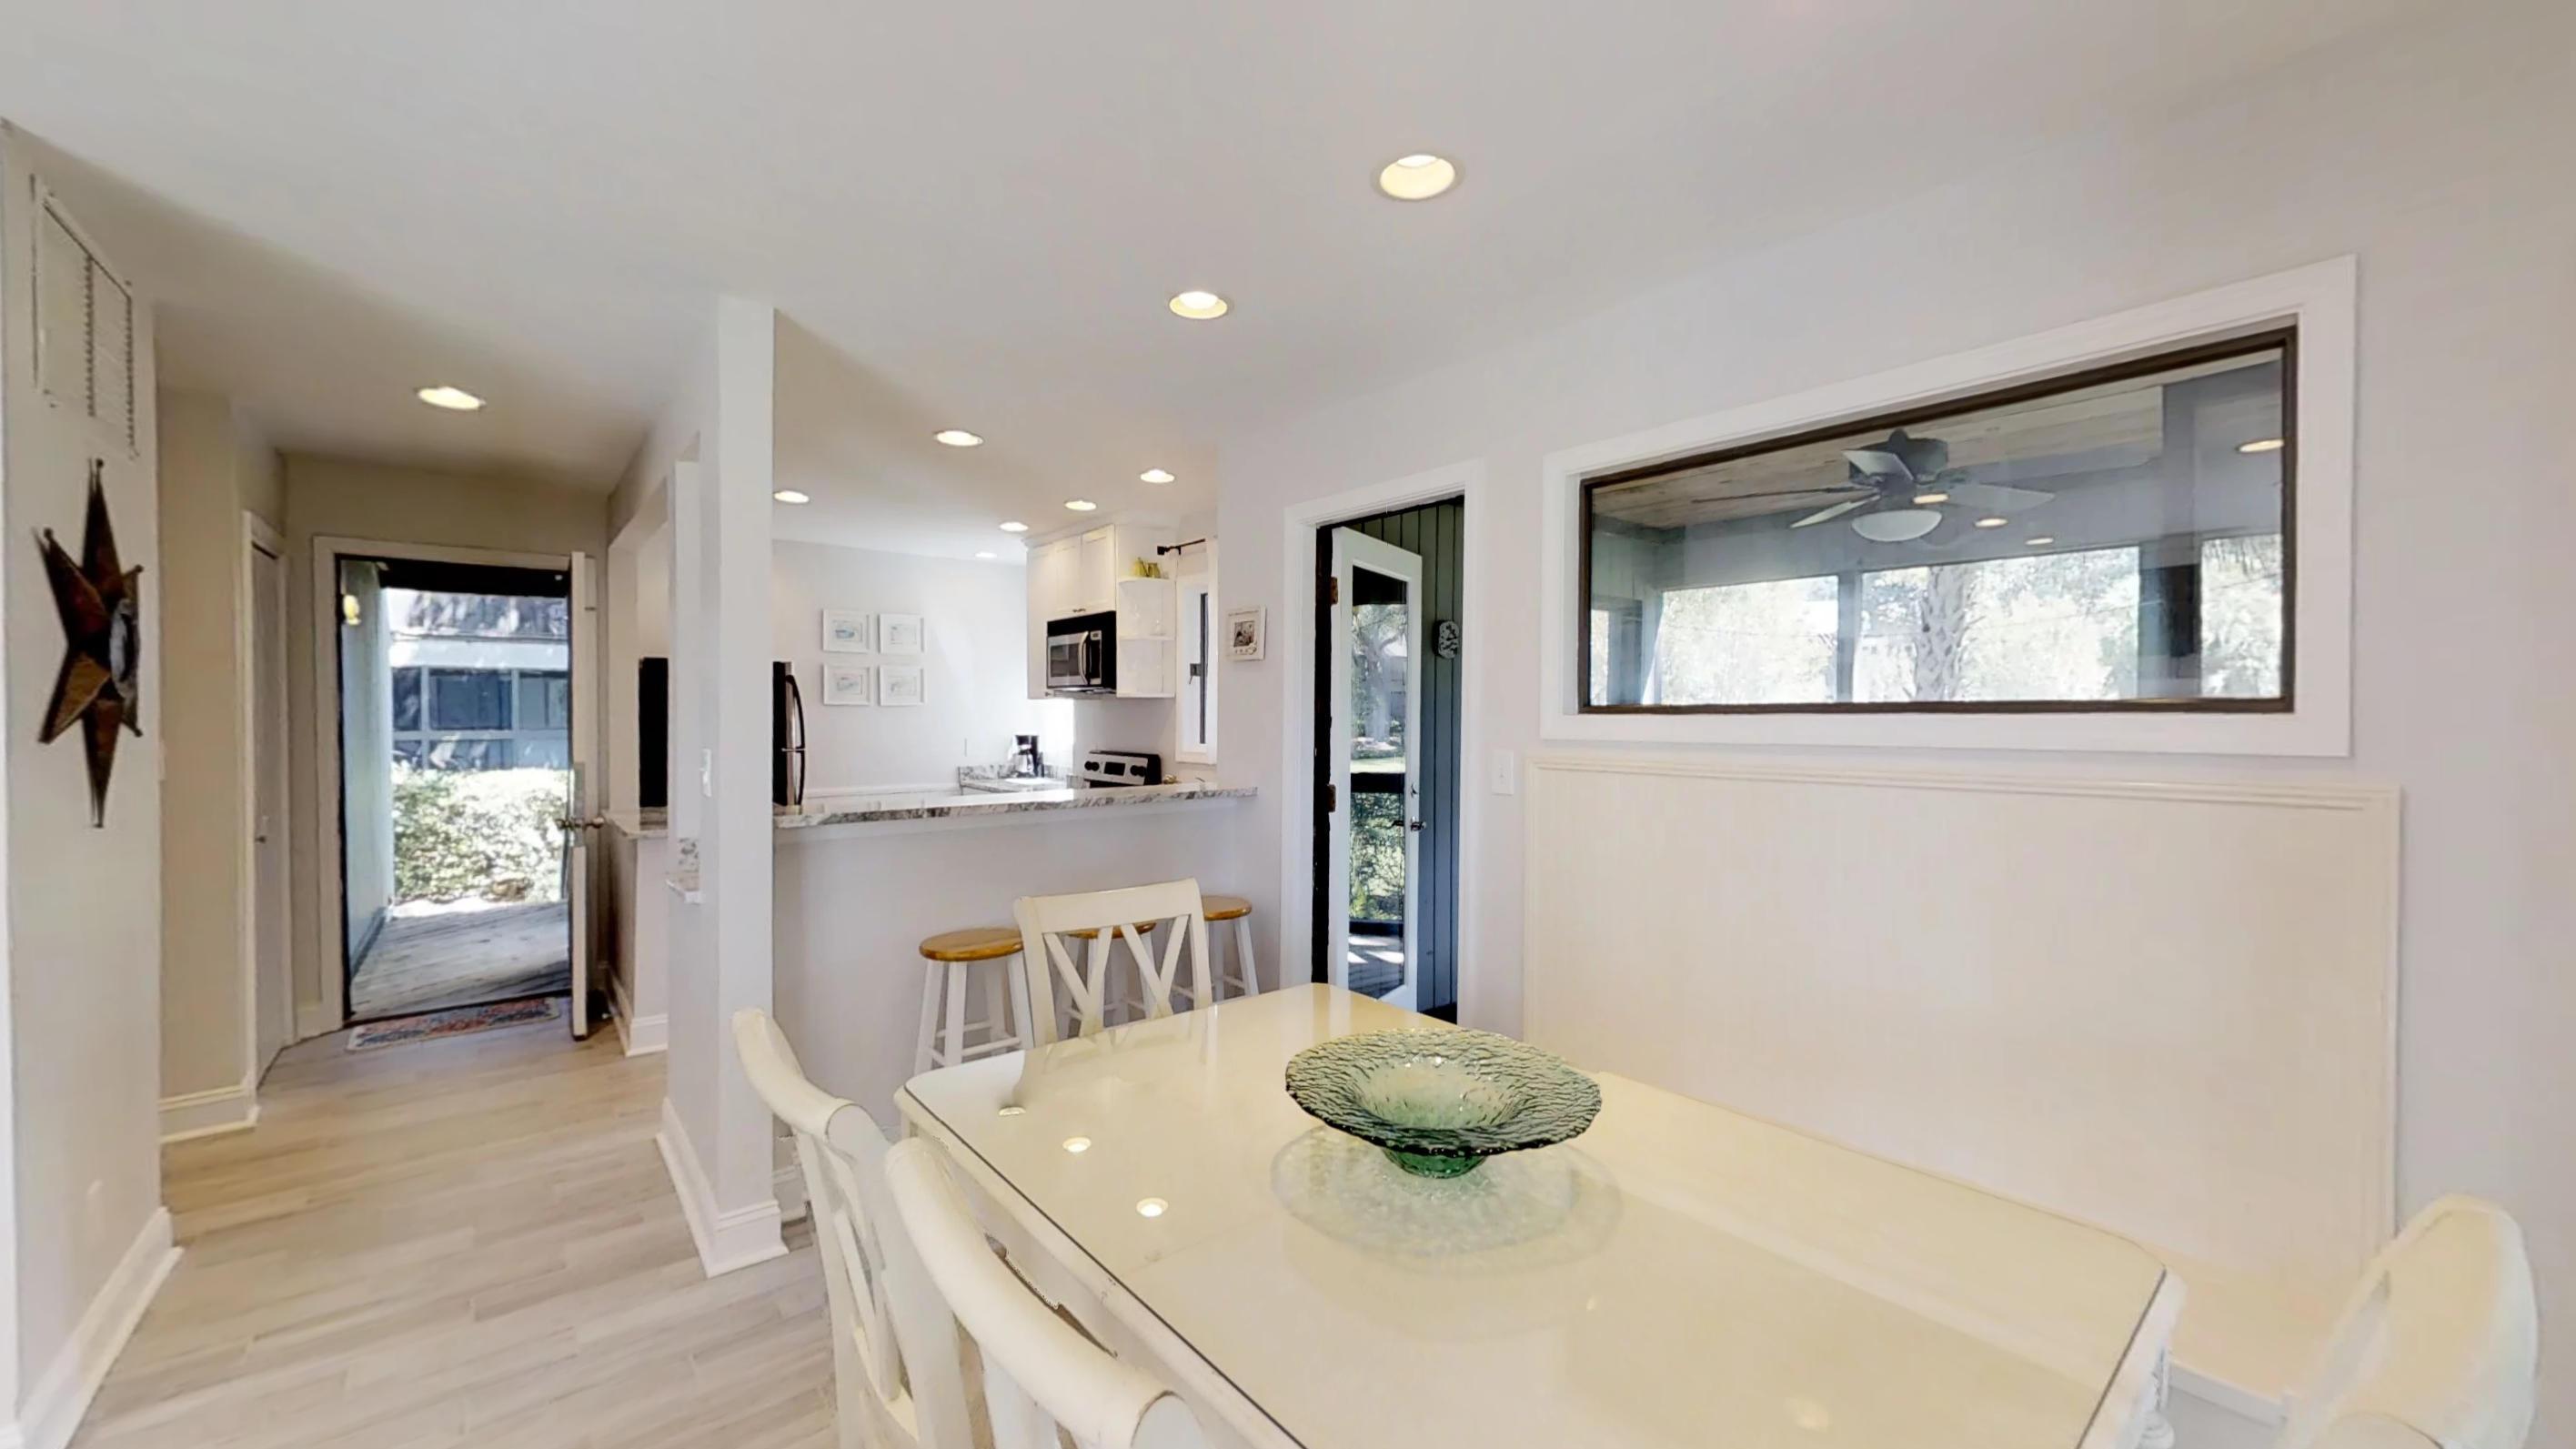 Kiawah Island Homes For Sale - 4511 Park Lake, Kiawah Island, SC - 10